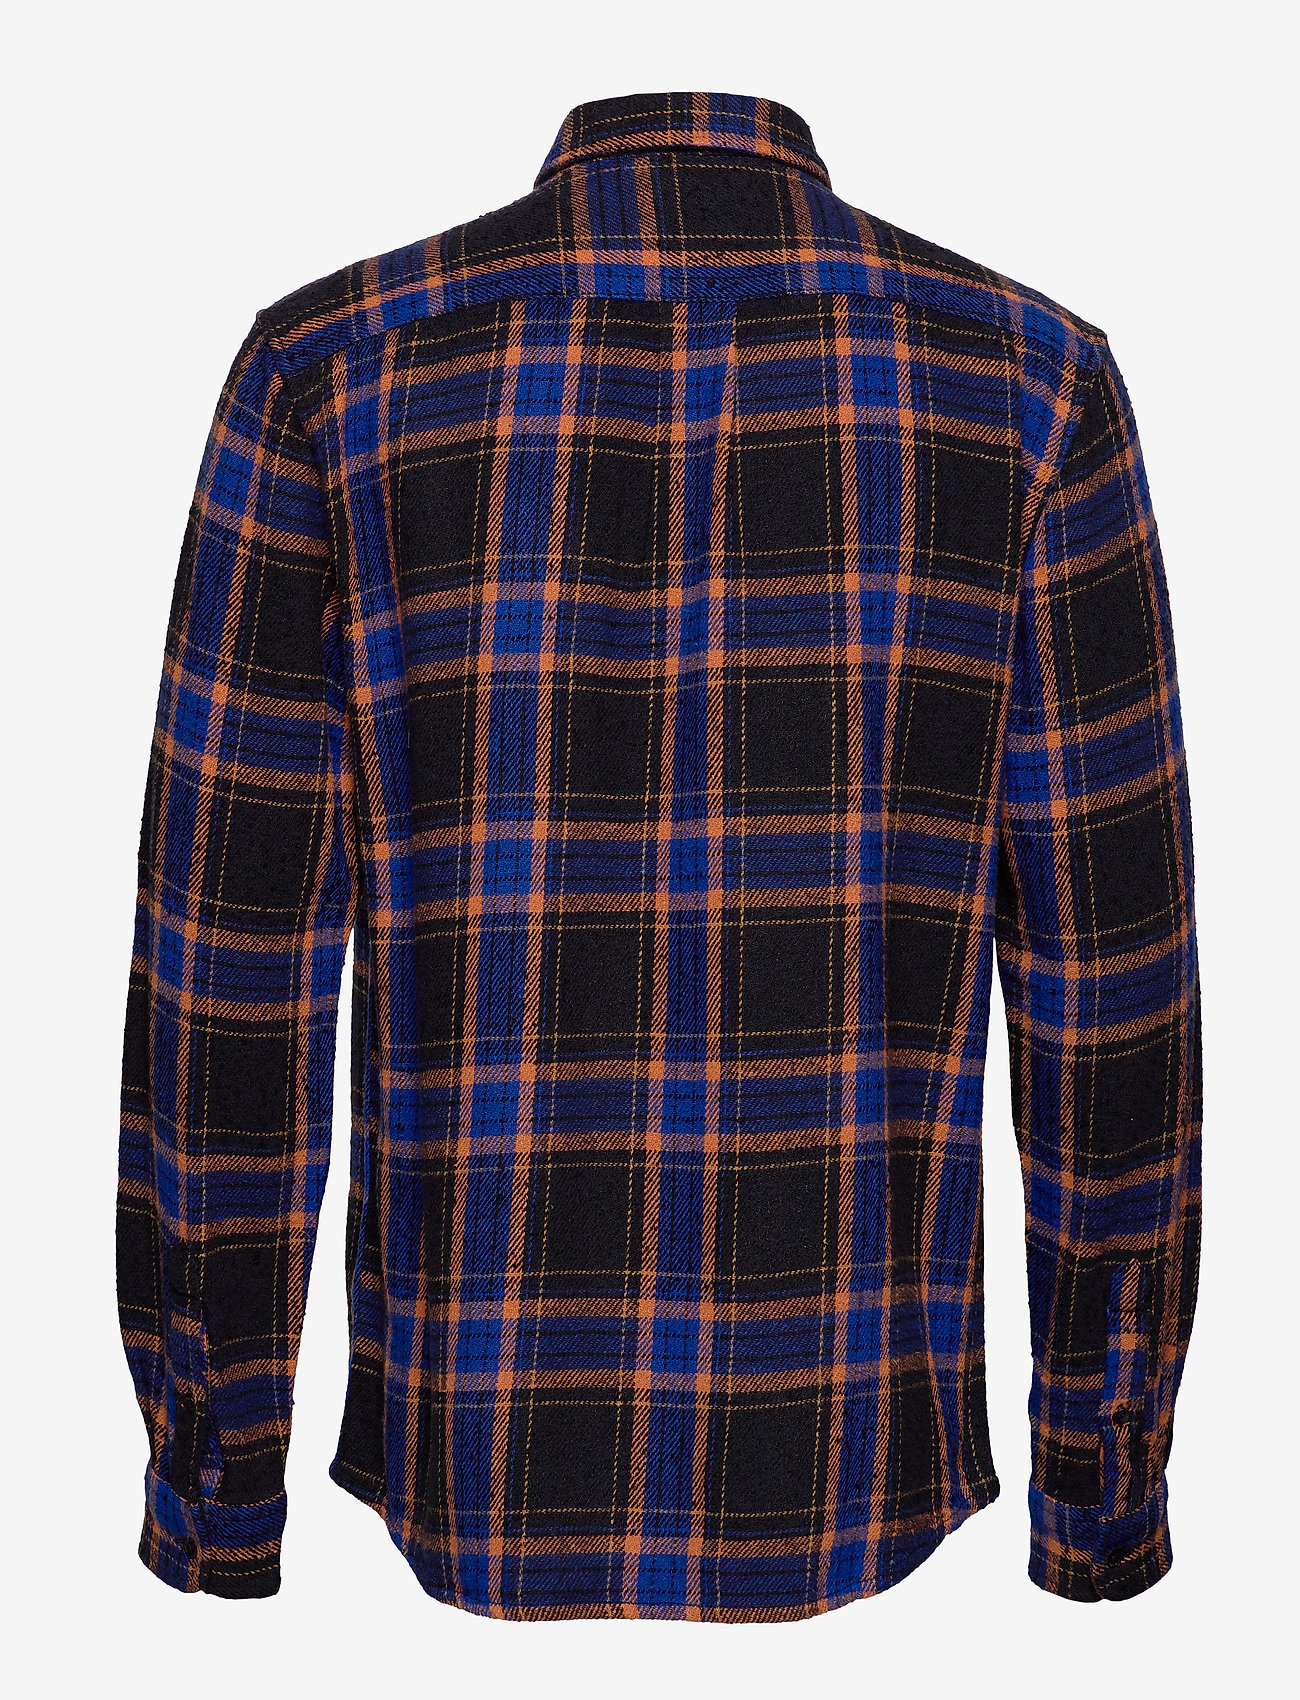 Ls 2 Pkt Flap Shirt Black (Black) - Wrangler rcq49c